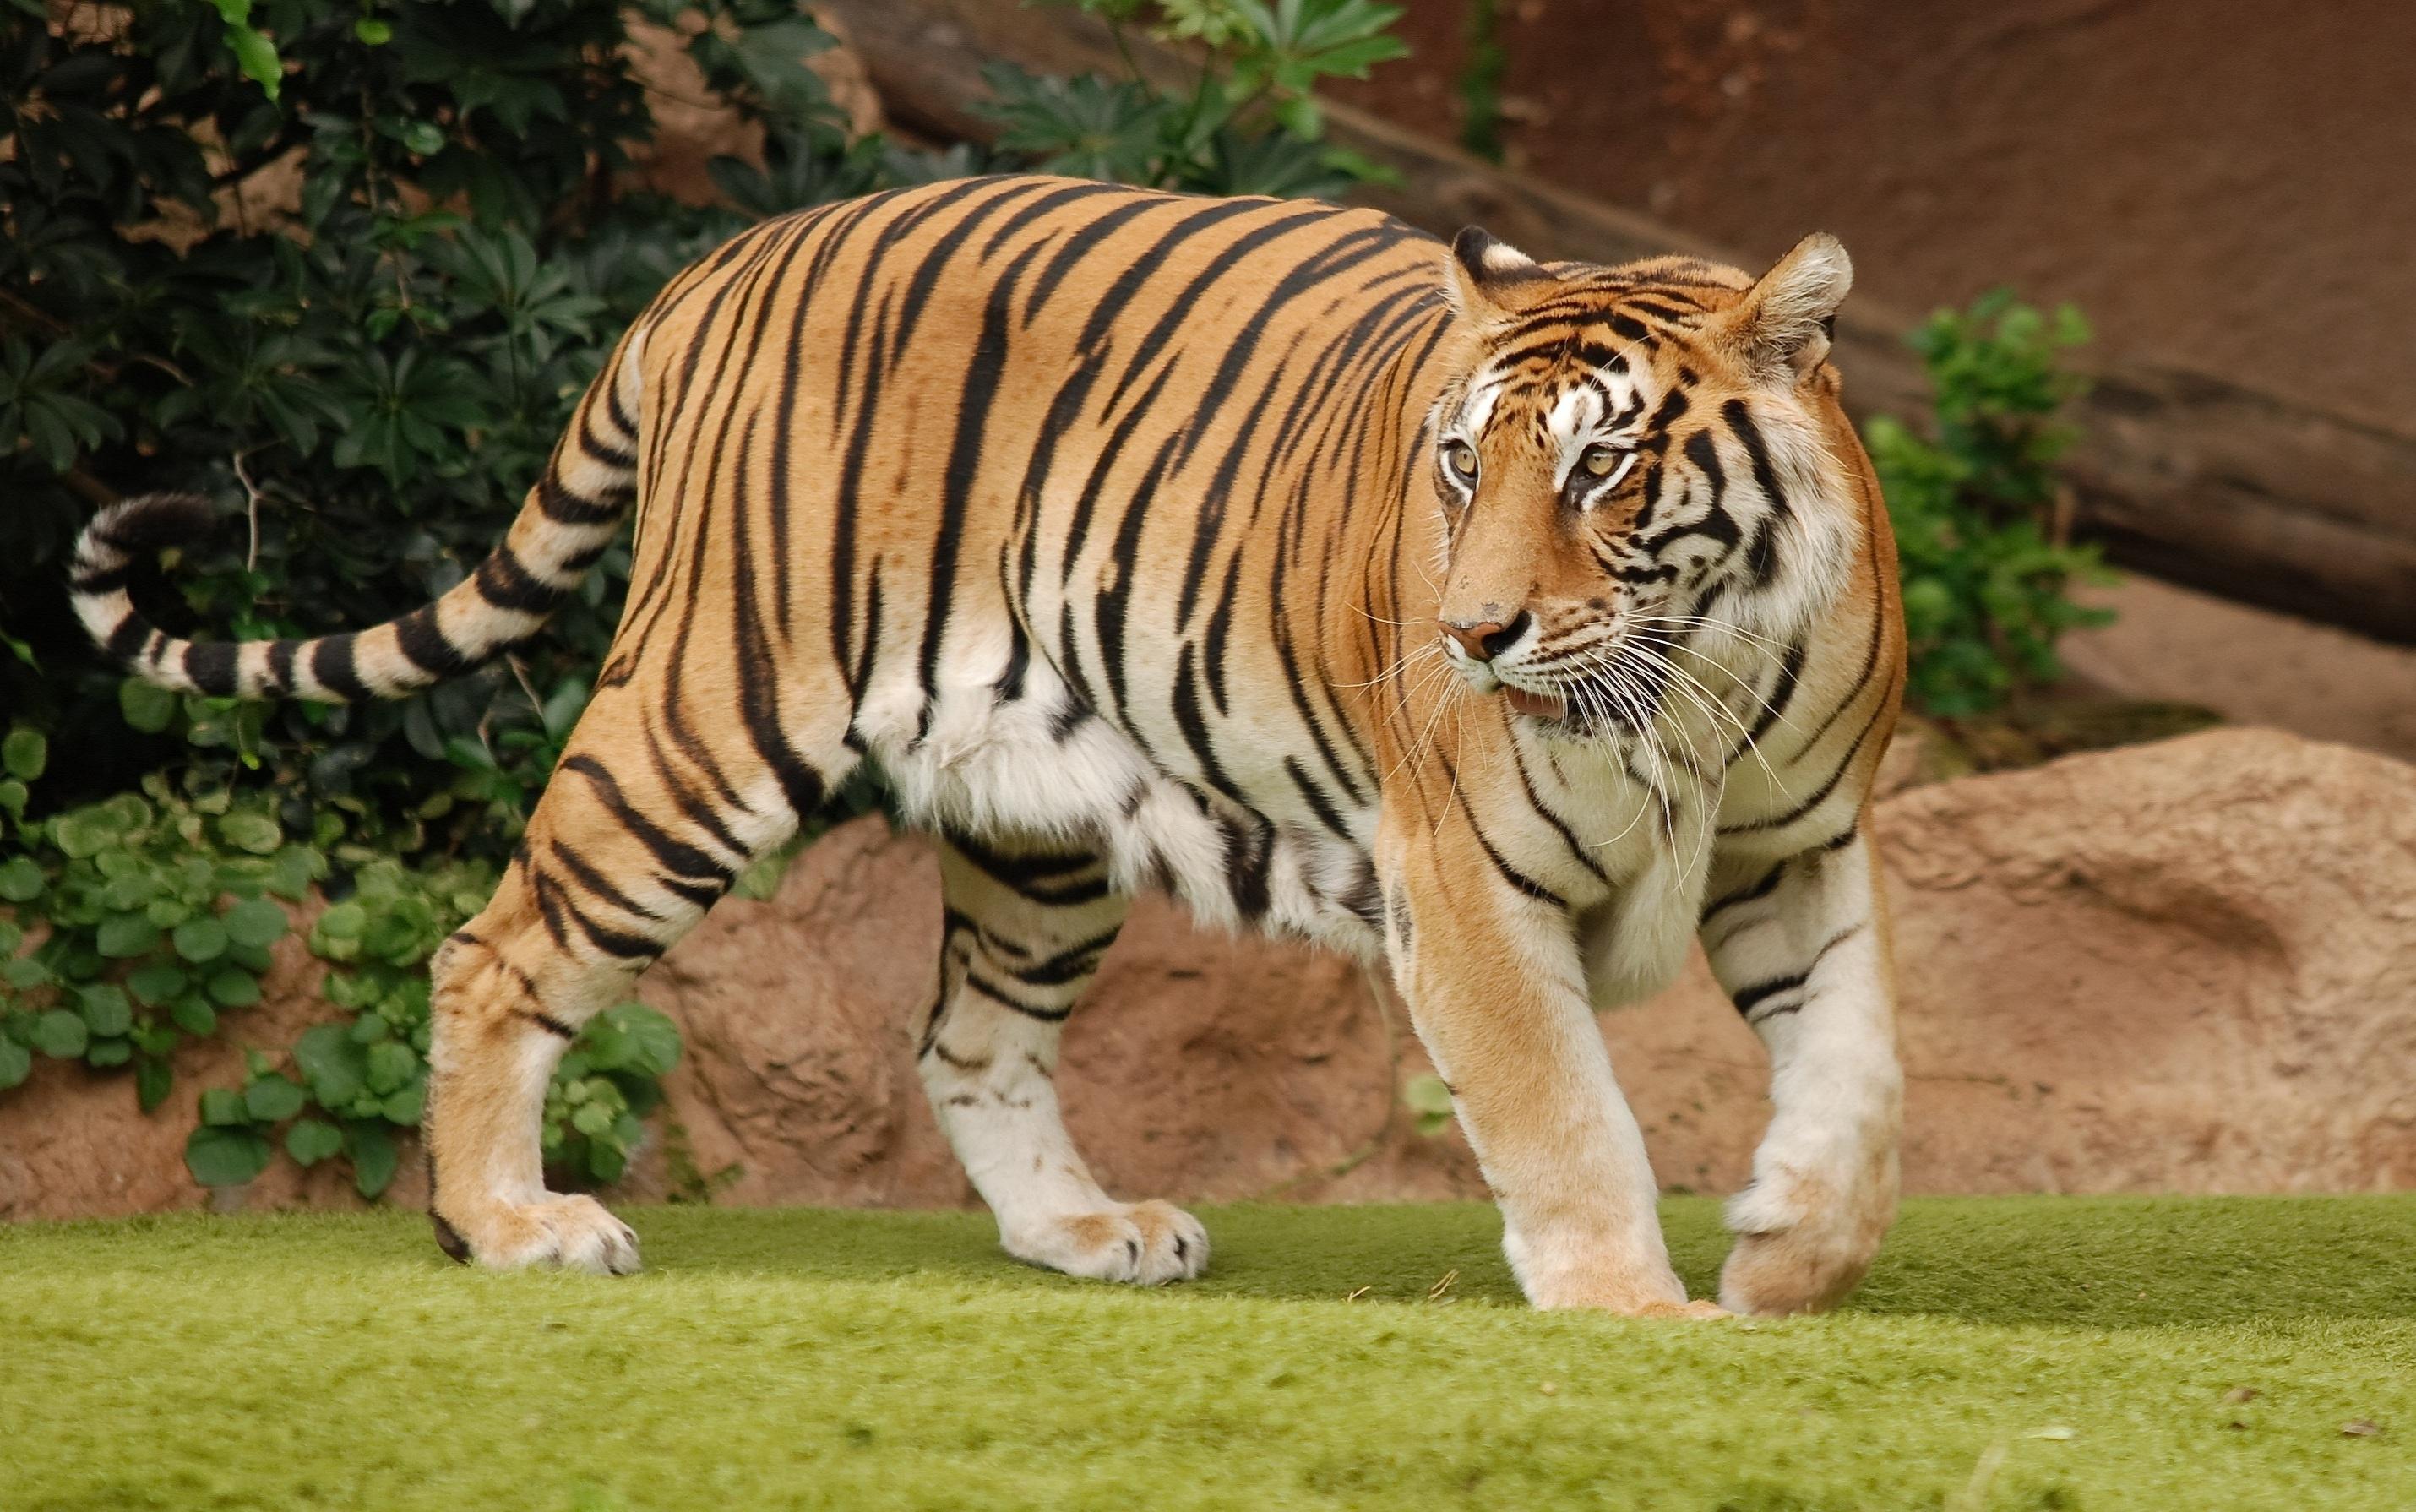 Group Of Dangerous Tiger Hd Wallpaper